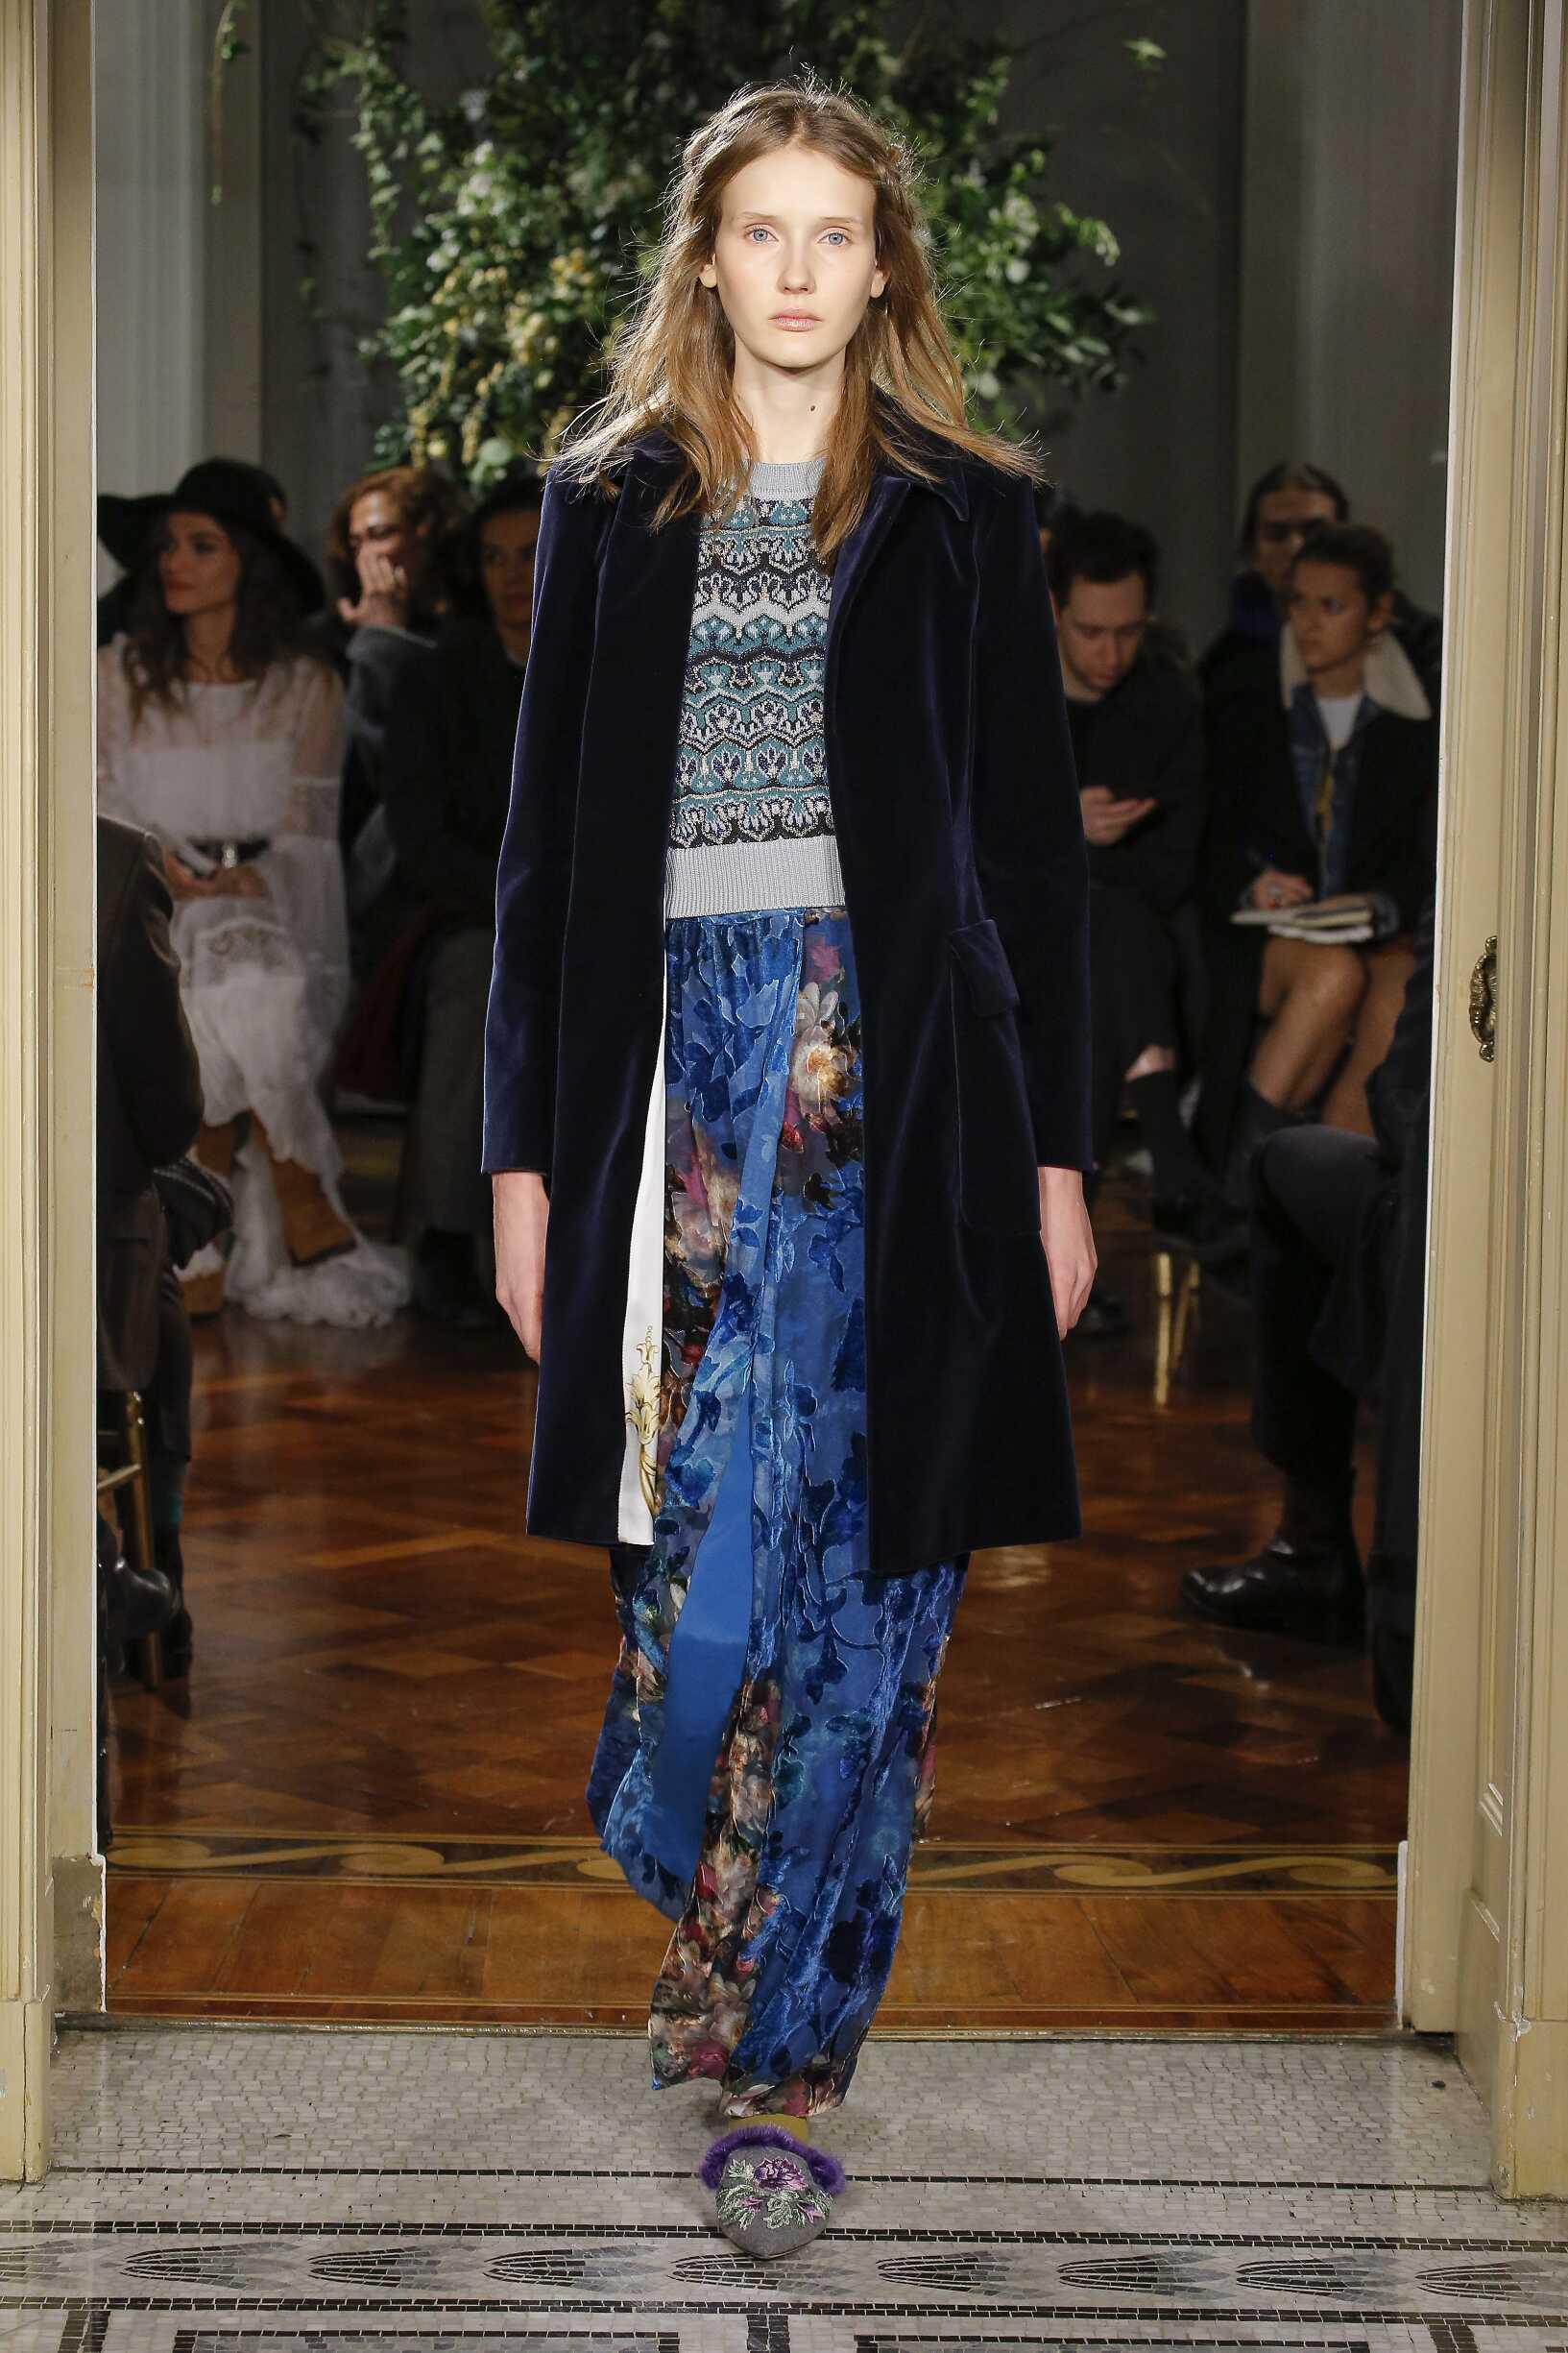 Fashion Woman Model Alberta Ferretti Catwalk 17-18